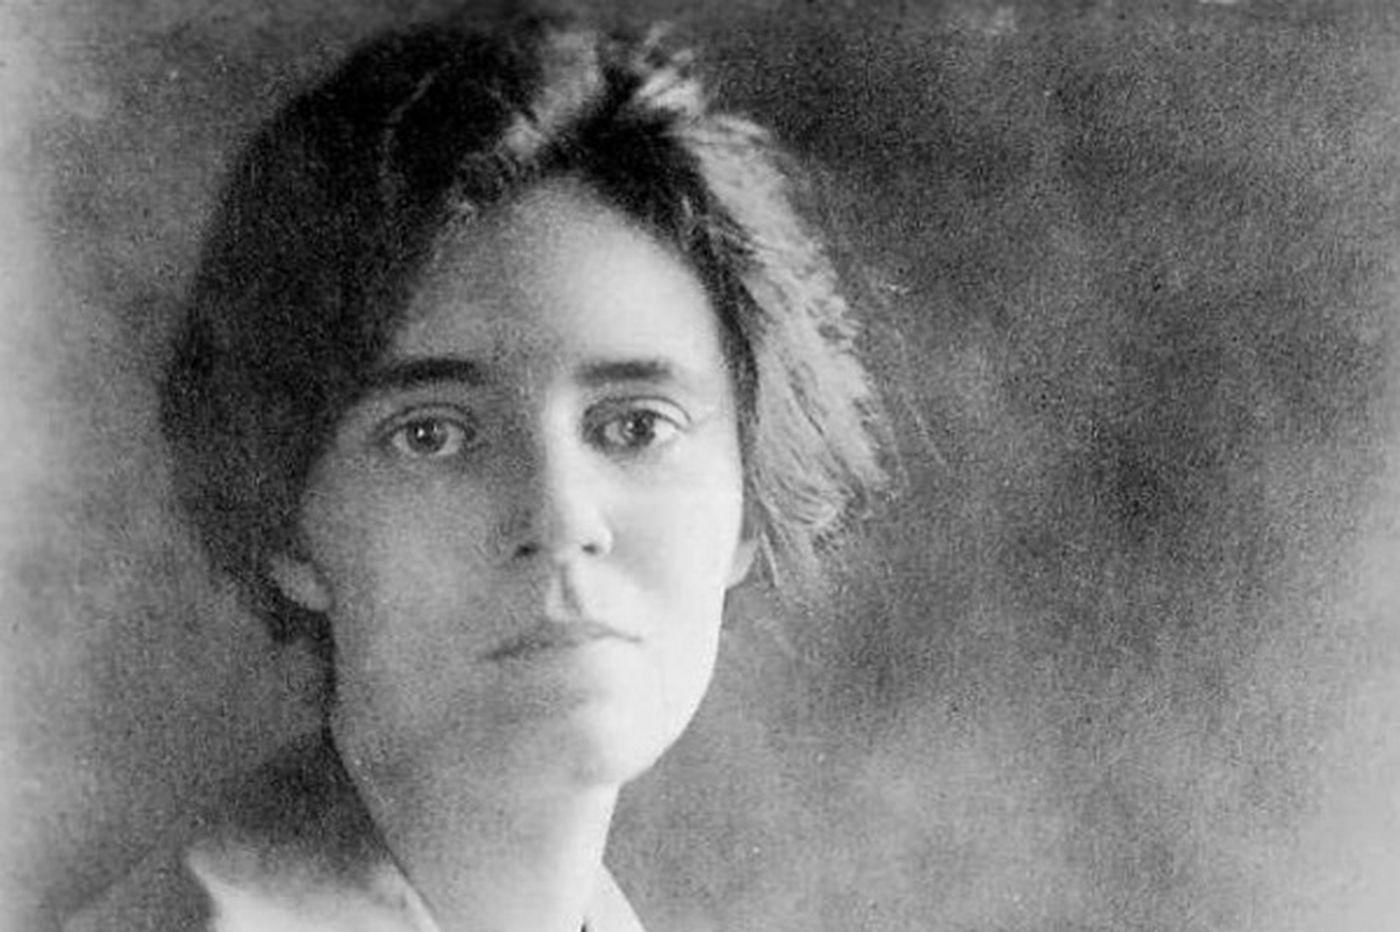 Suffragist tale still inspires